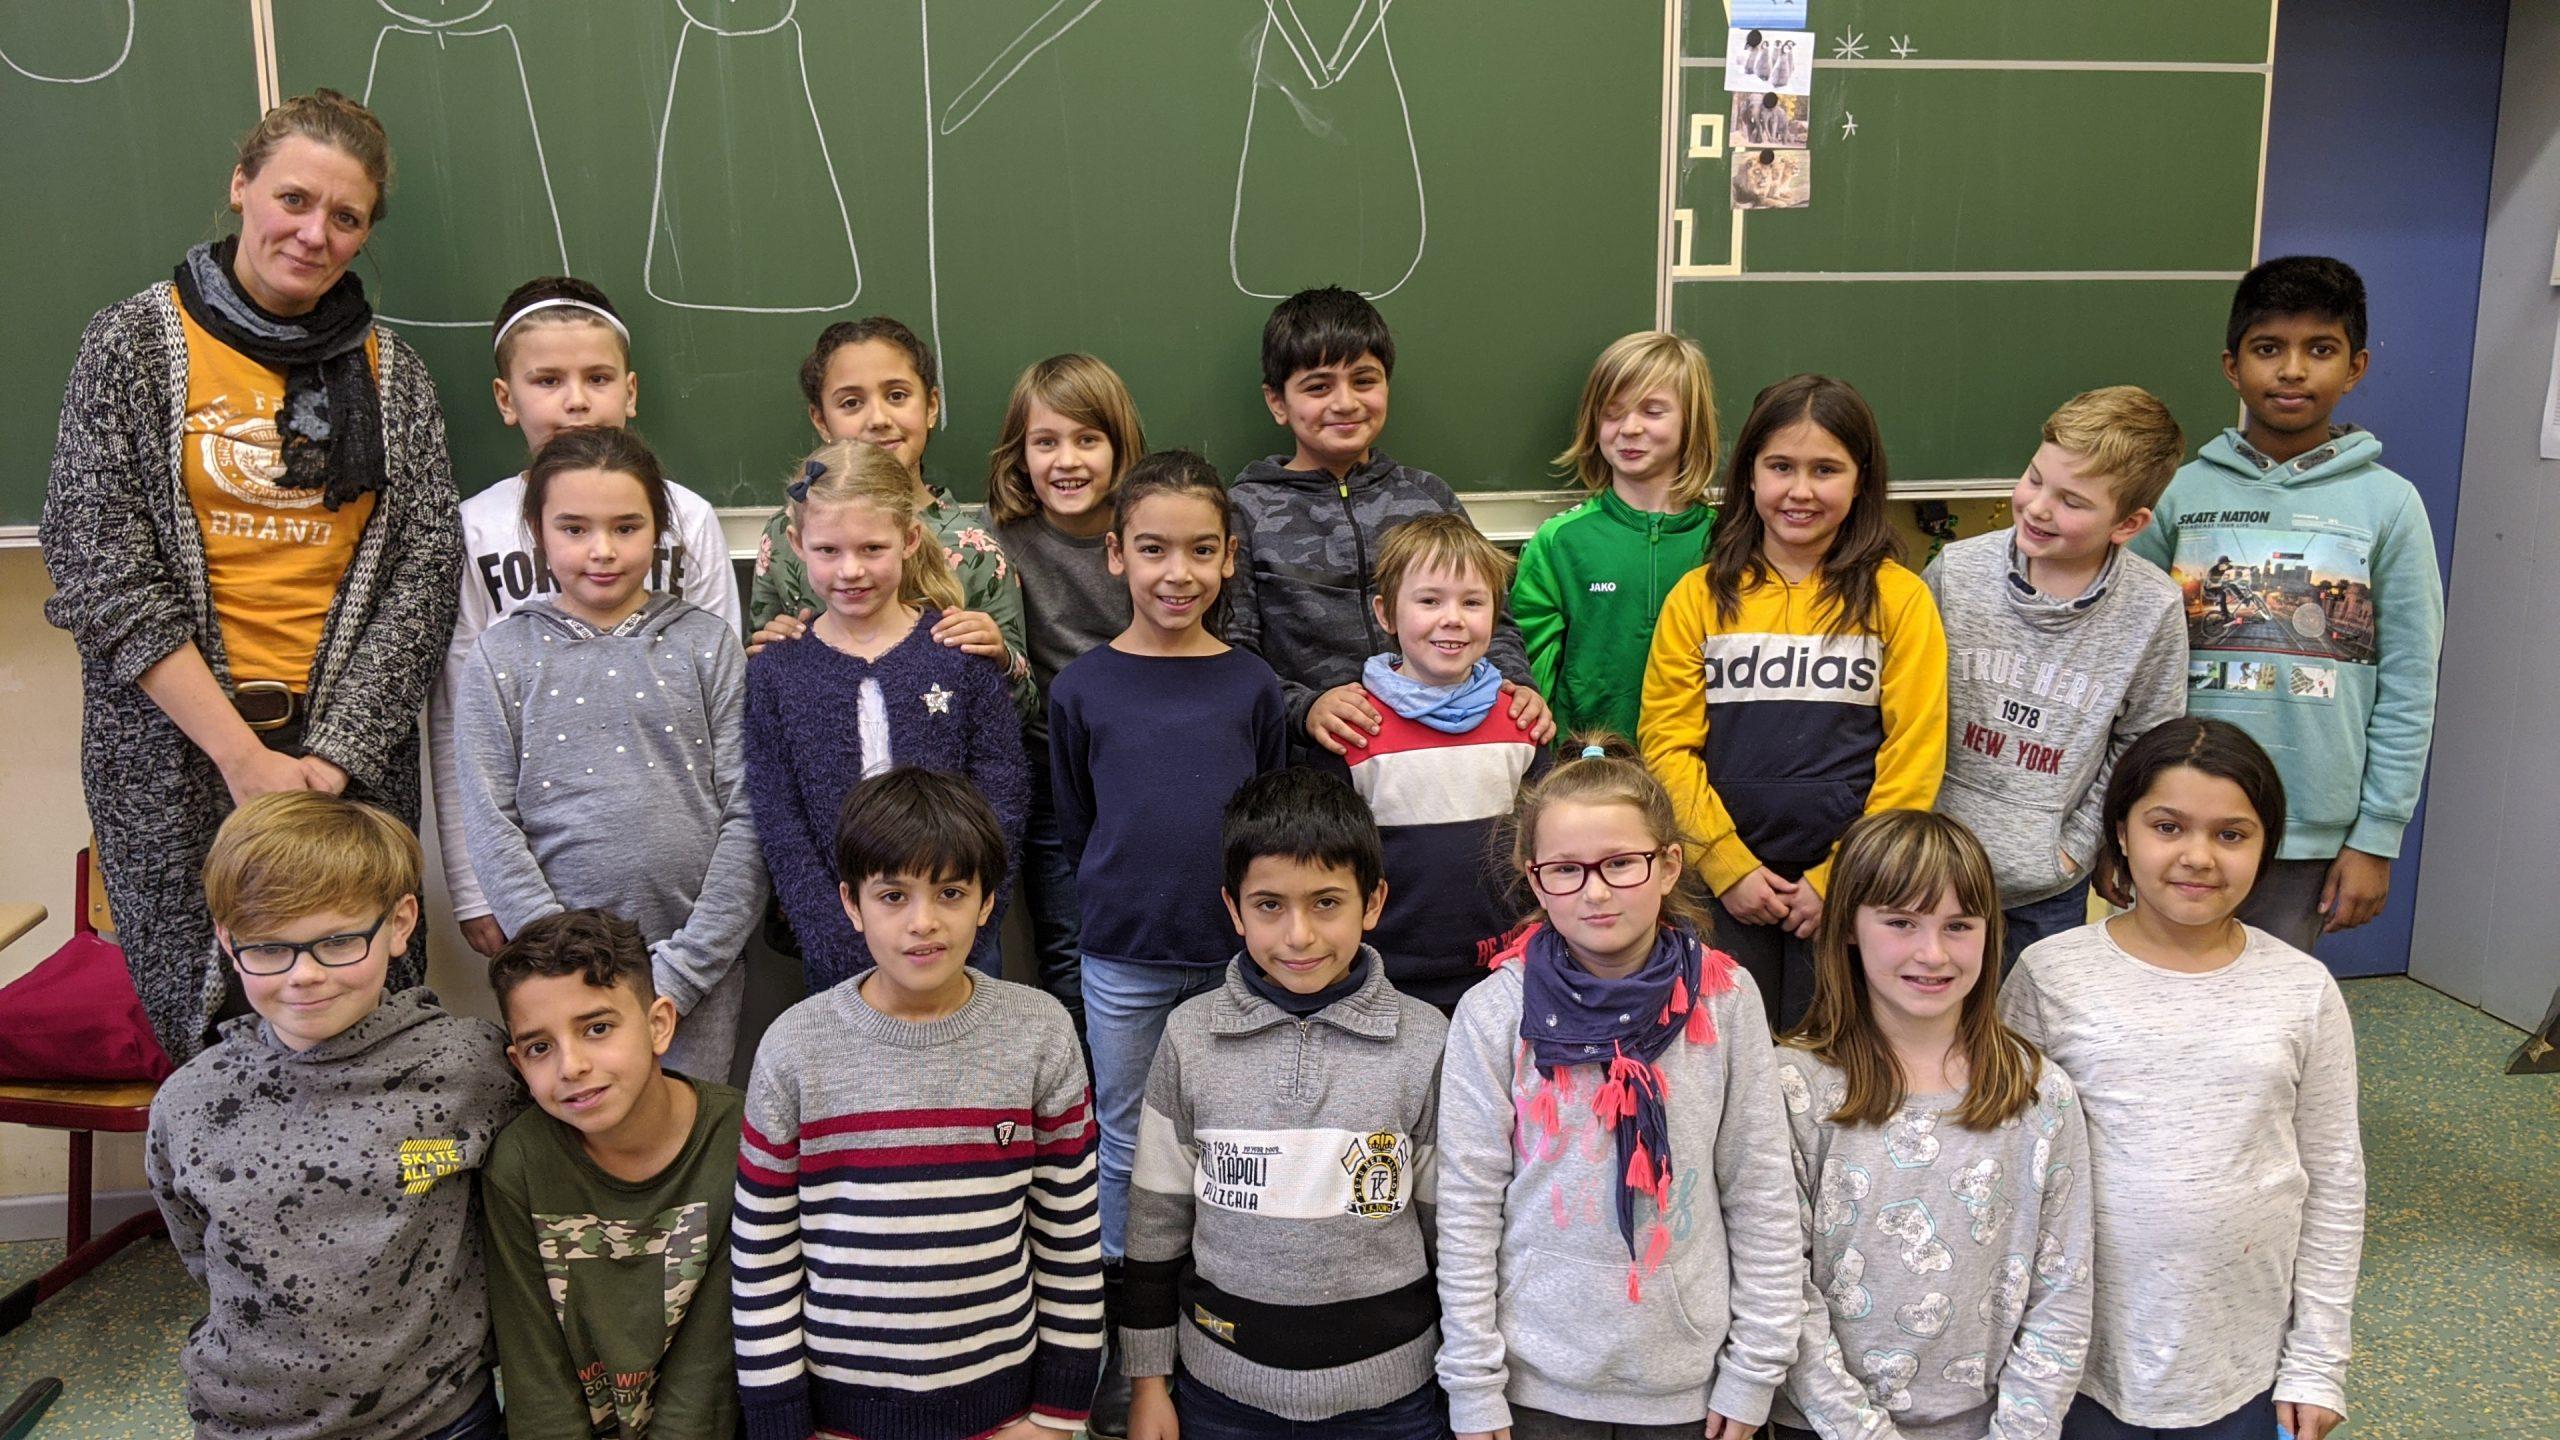 Drachenklasse 3b, Klassenfoto 2019